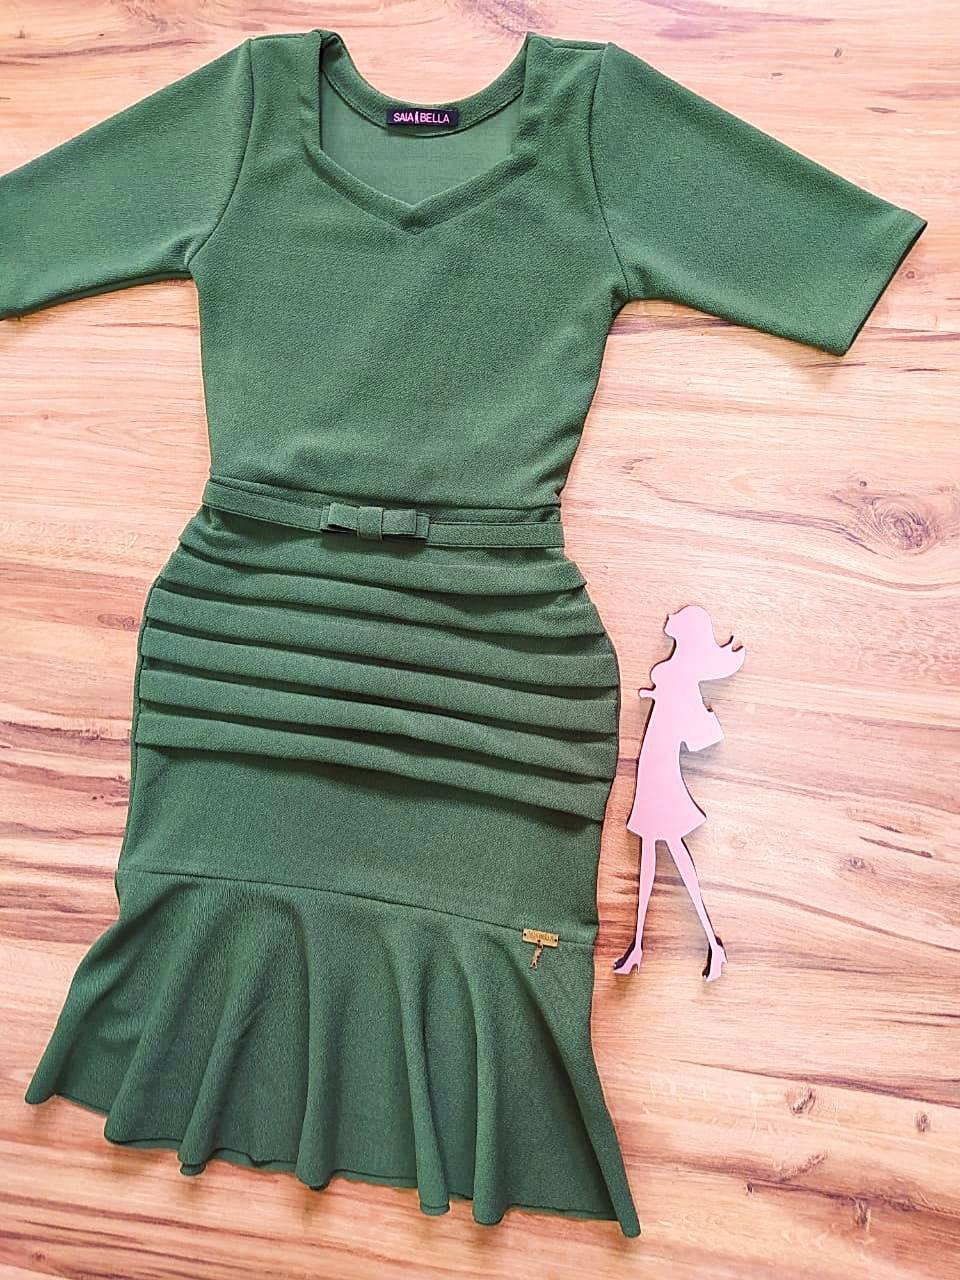 Vestido Peplum Roberta Saia Bella - SB7100875 -  Verde